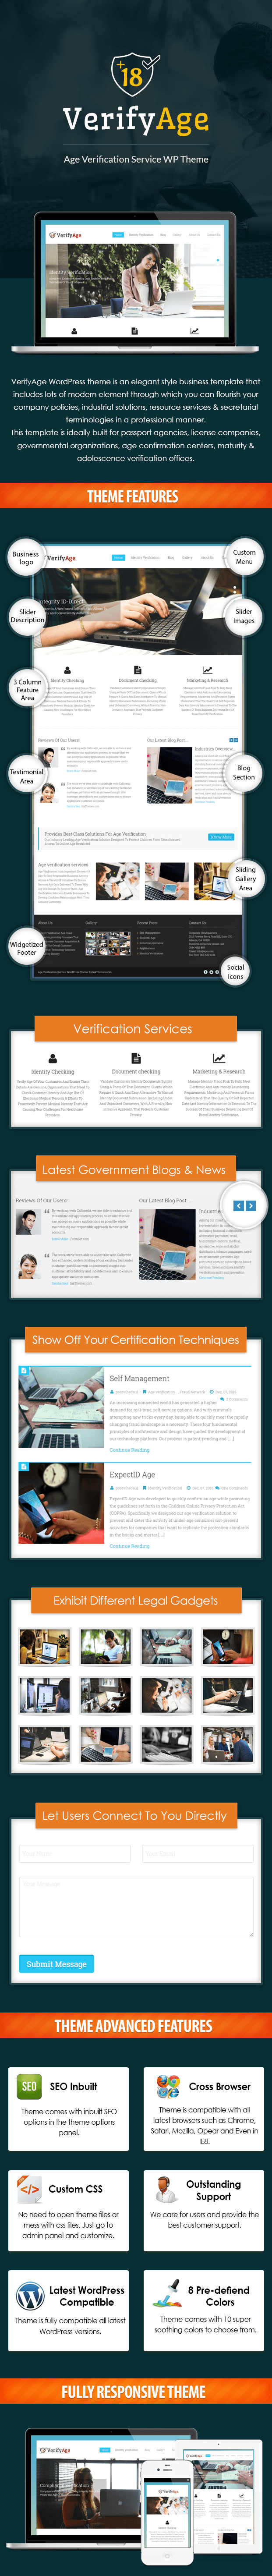 Age Verification Service WordPress Theme